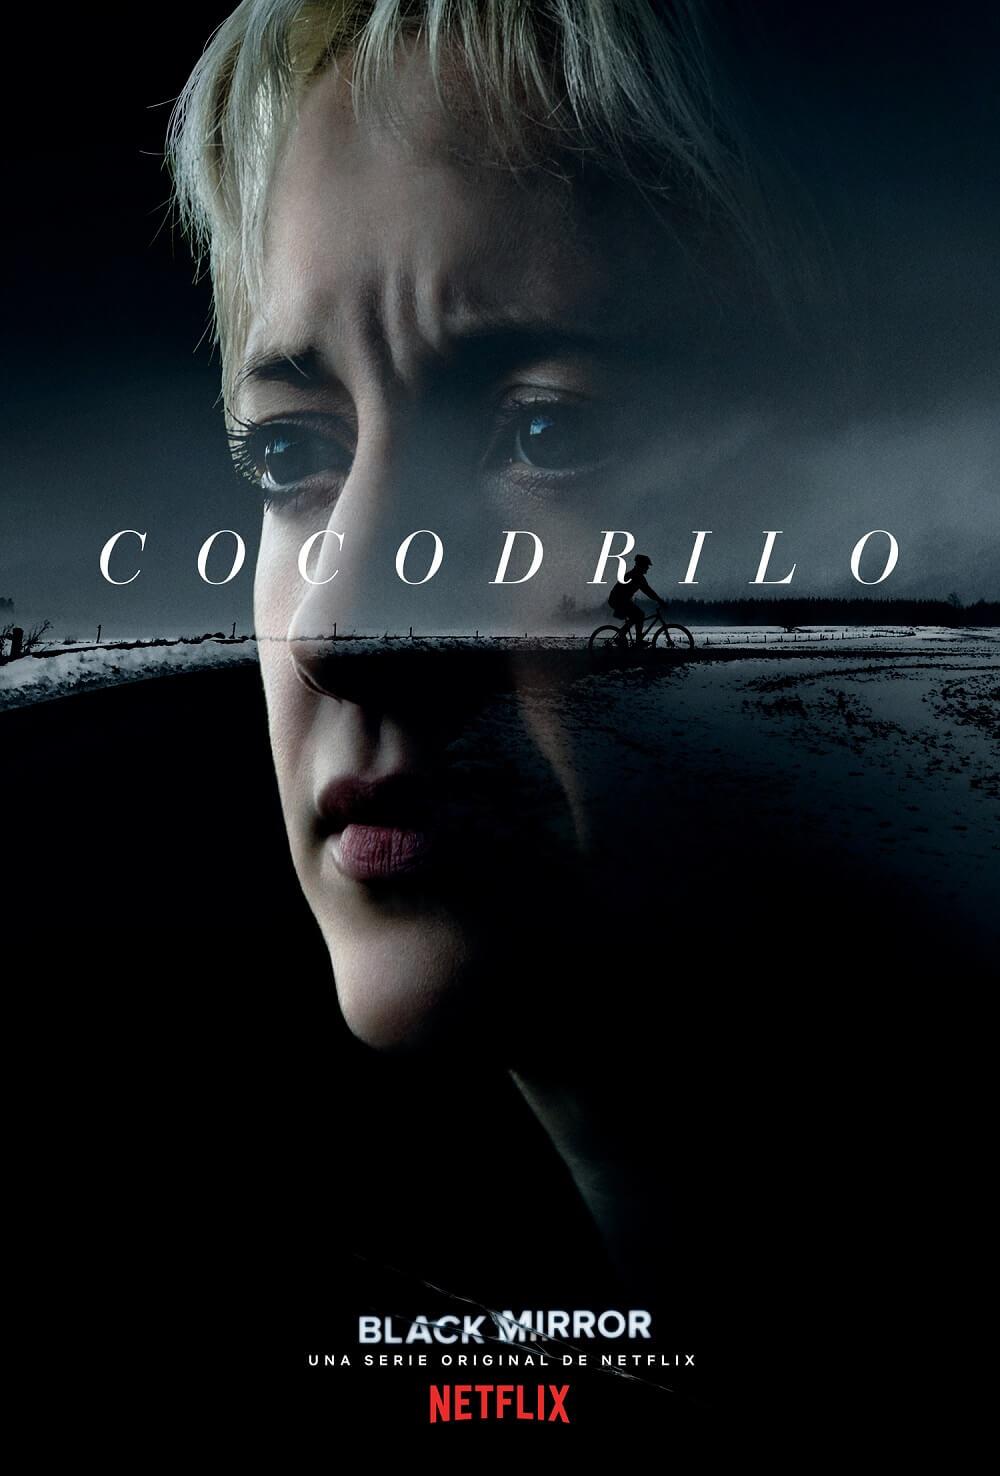 Póster Black Mirror - Cocodrilo (1)